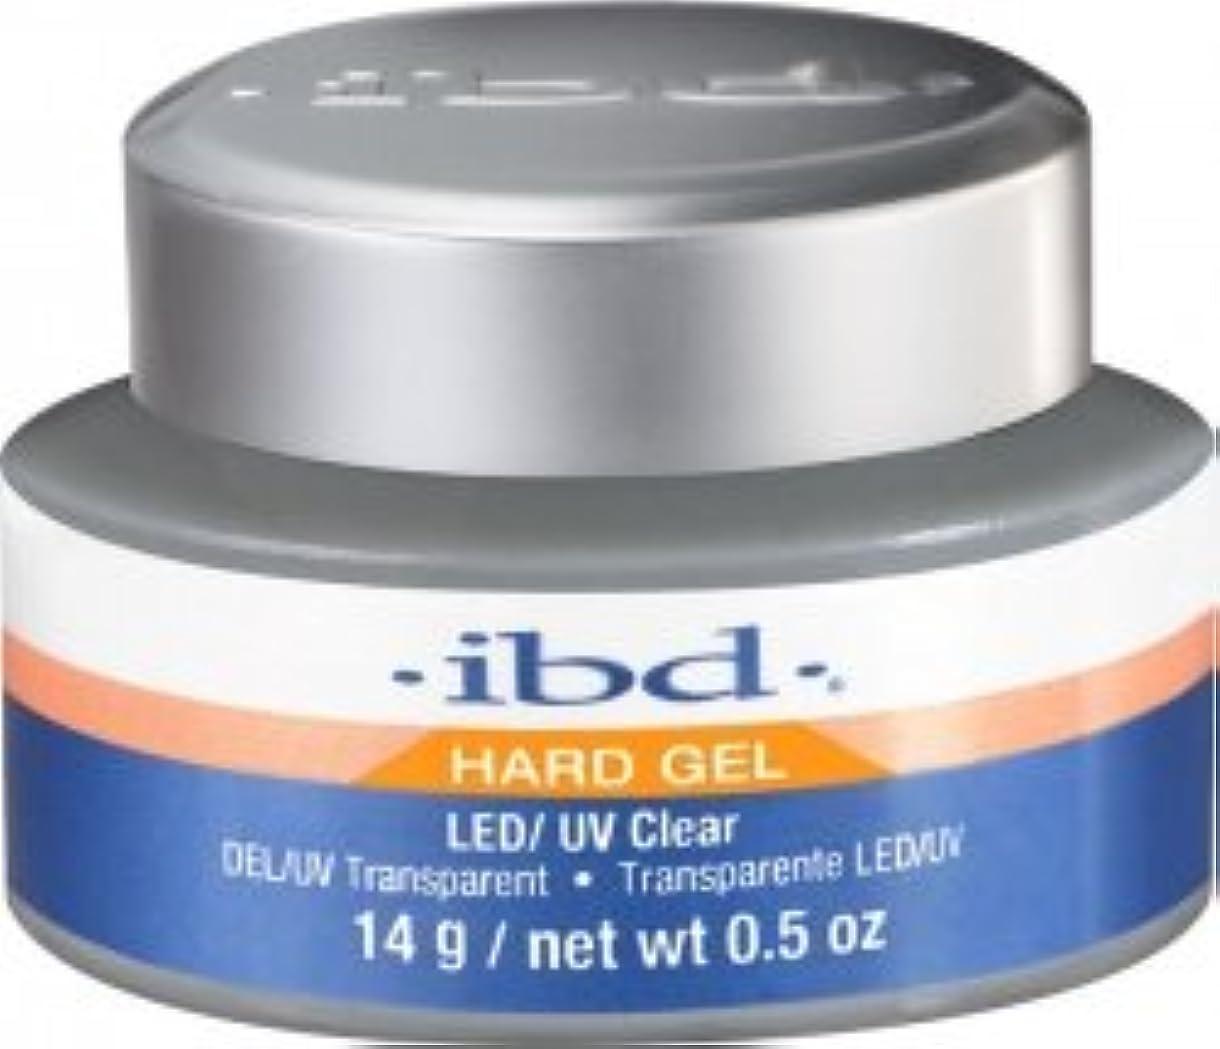 論文評議会面倒IBD LED/UV Clear Gel - .5oz 14g [並行輸入品]